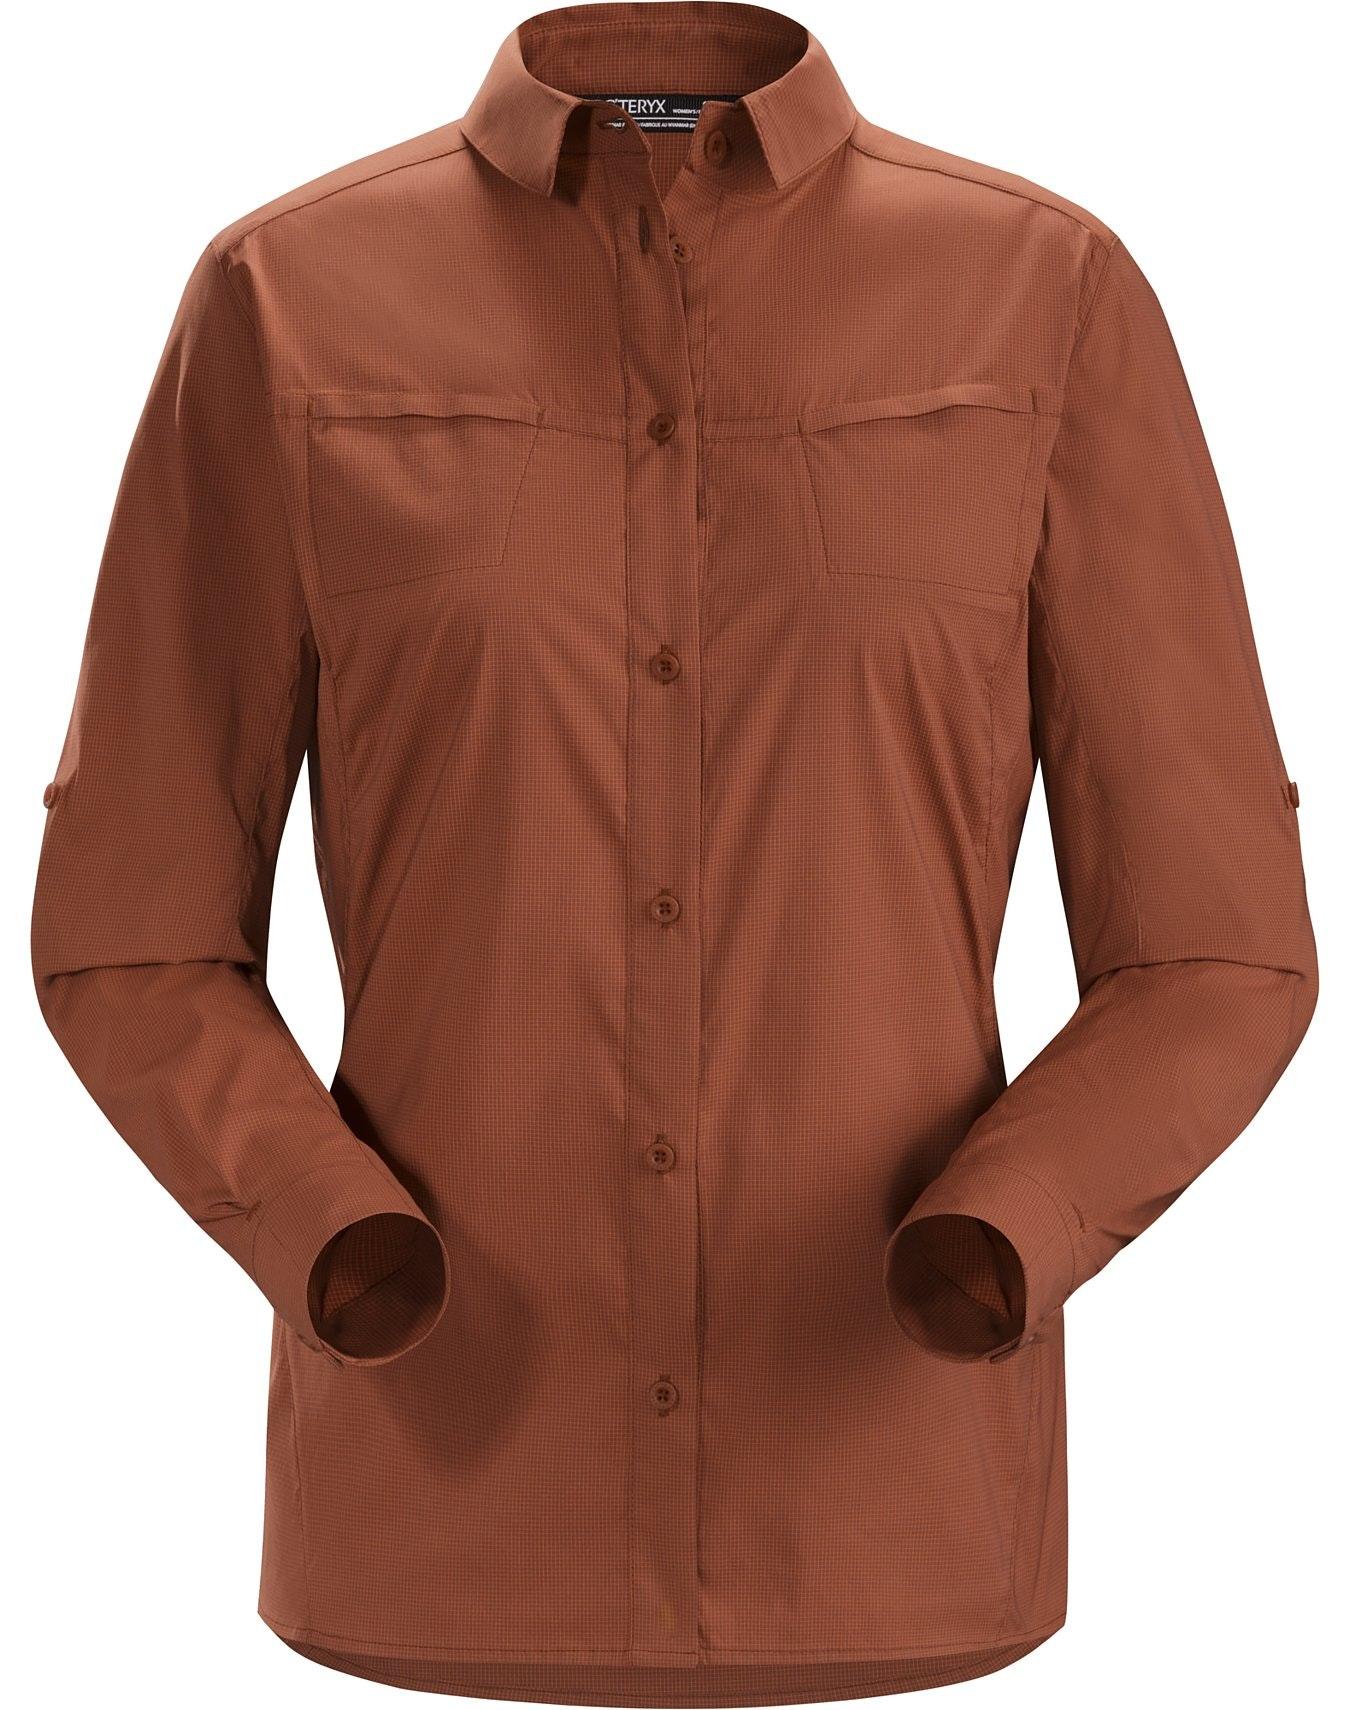 307a1b161 Fernie Shirt LS / Womens / Arc'teryx